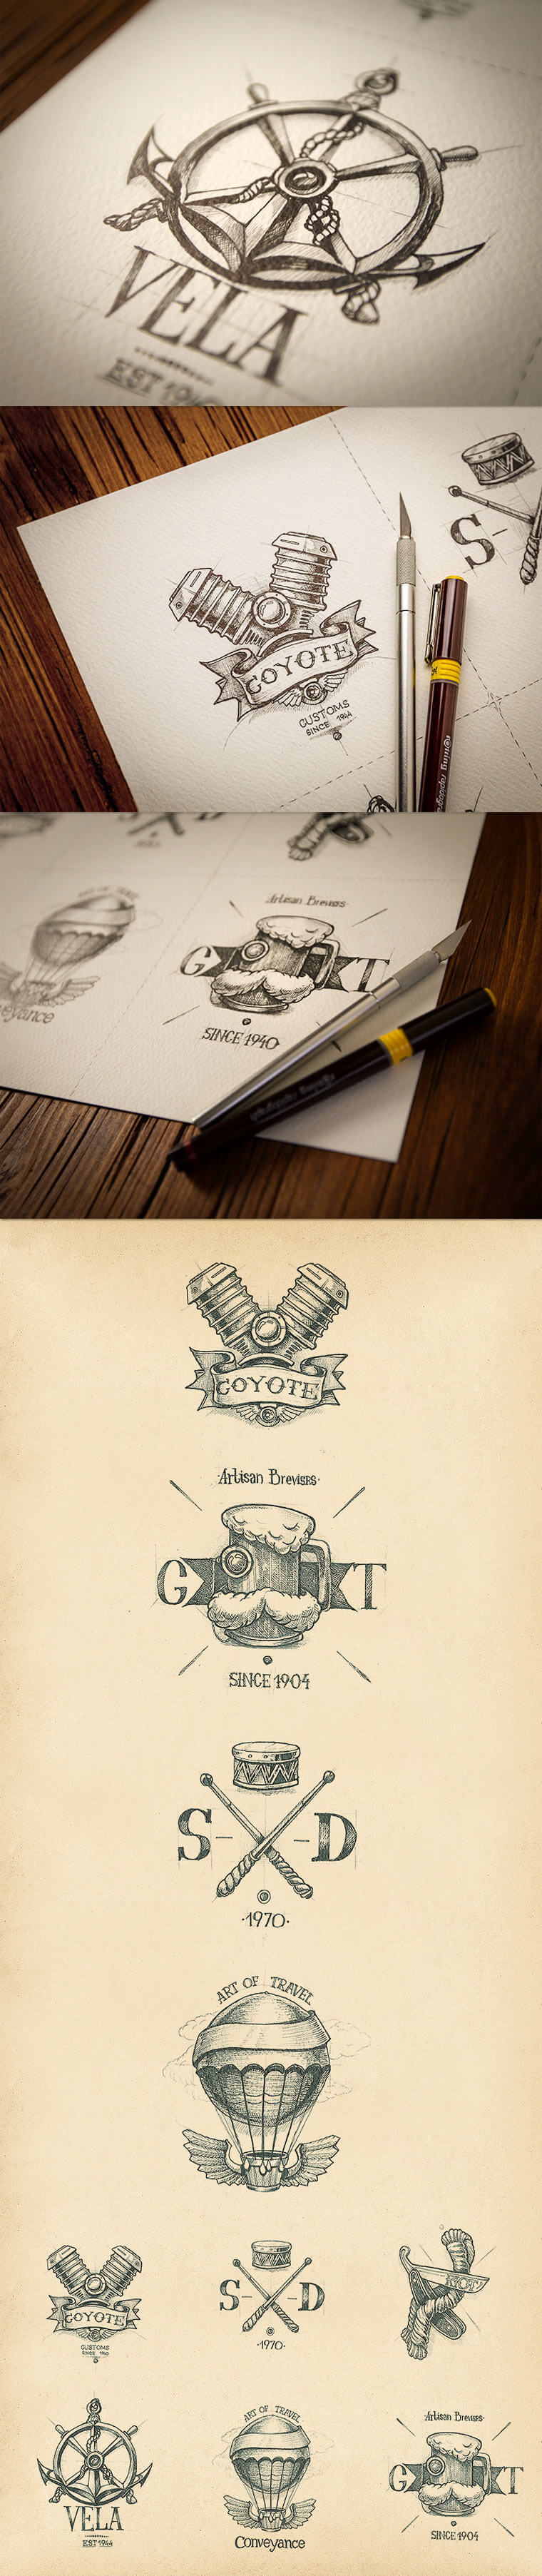 20 gezeichnete Logoskizzen logoskizzen_02